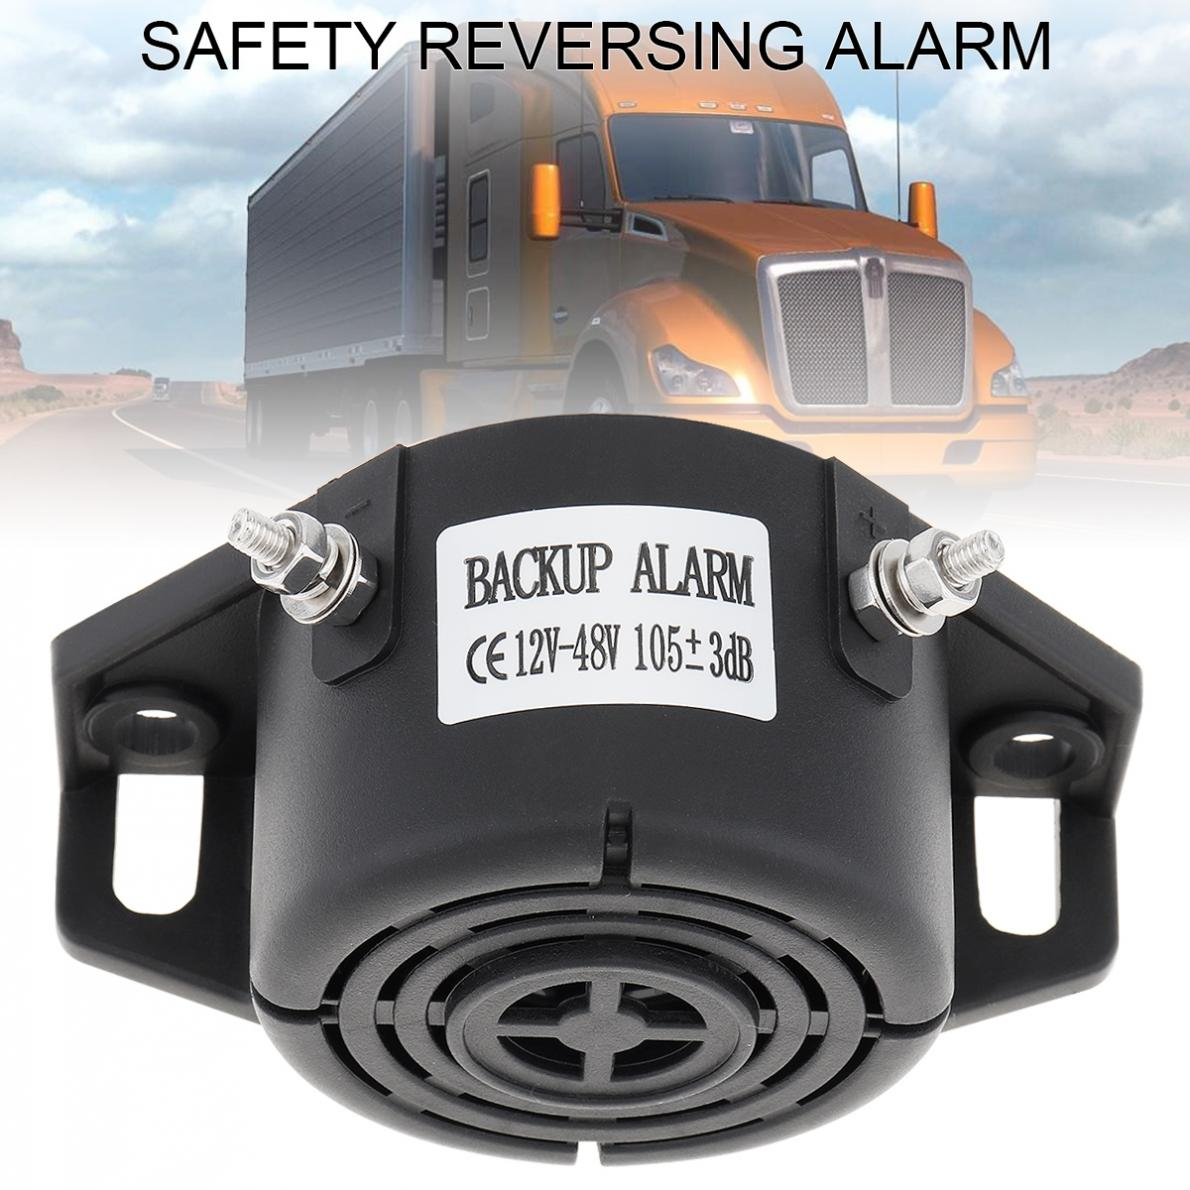 12V-48V 105dB Car Motorcycle Vehicle Reversing Horn Back up Alarm Horn Speaker Reverse Auto Warning Fit for Motorcycle Car